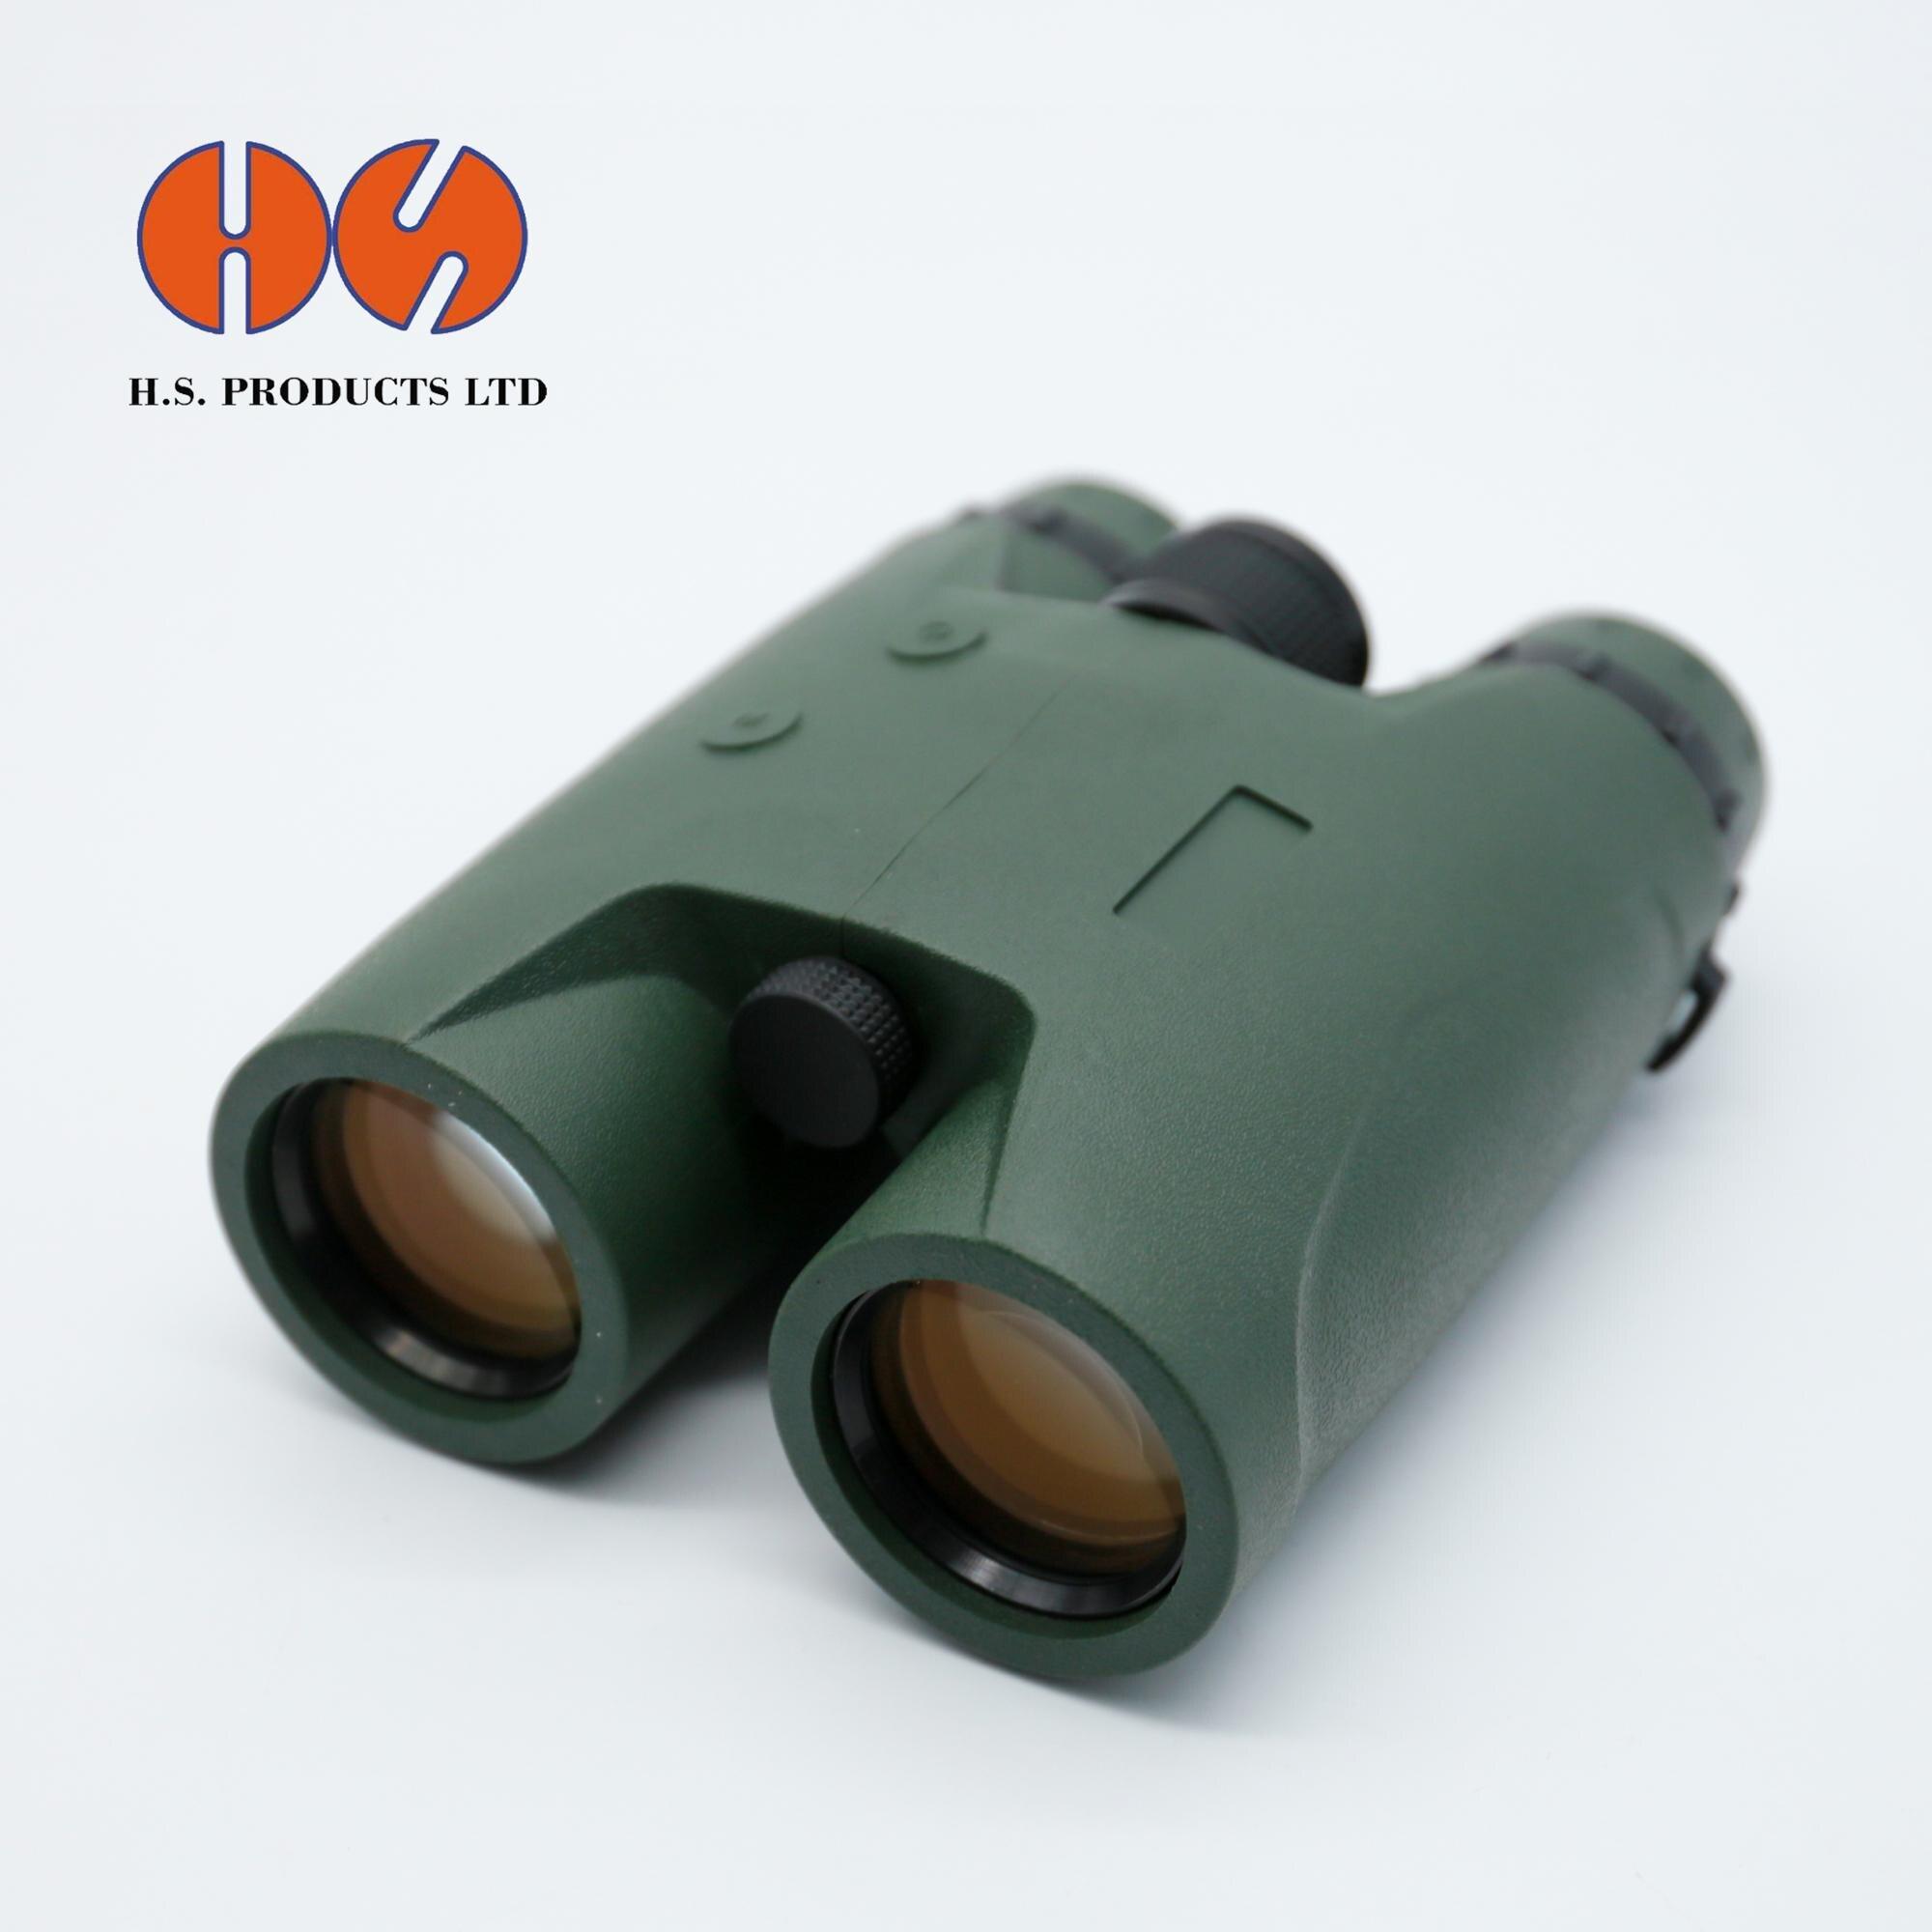 Distance Measuring Binoculars Hunting Laser Rangefinder